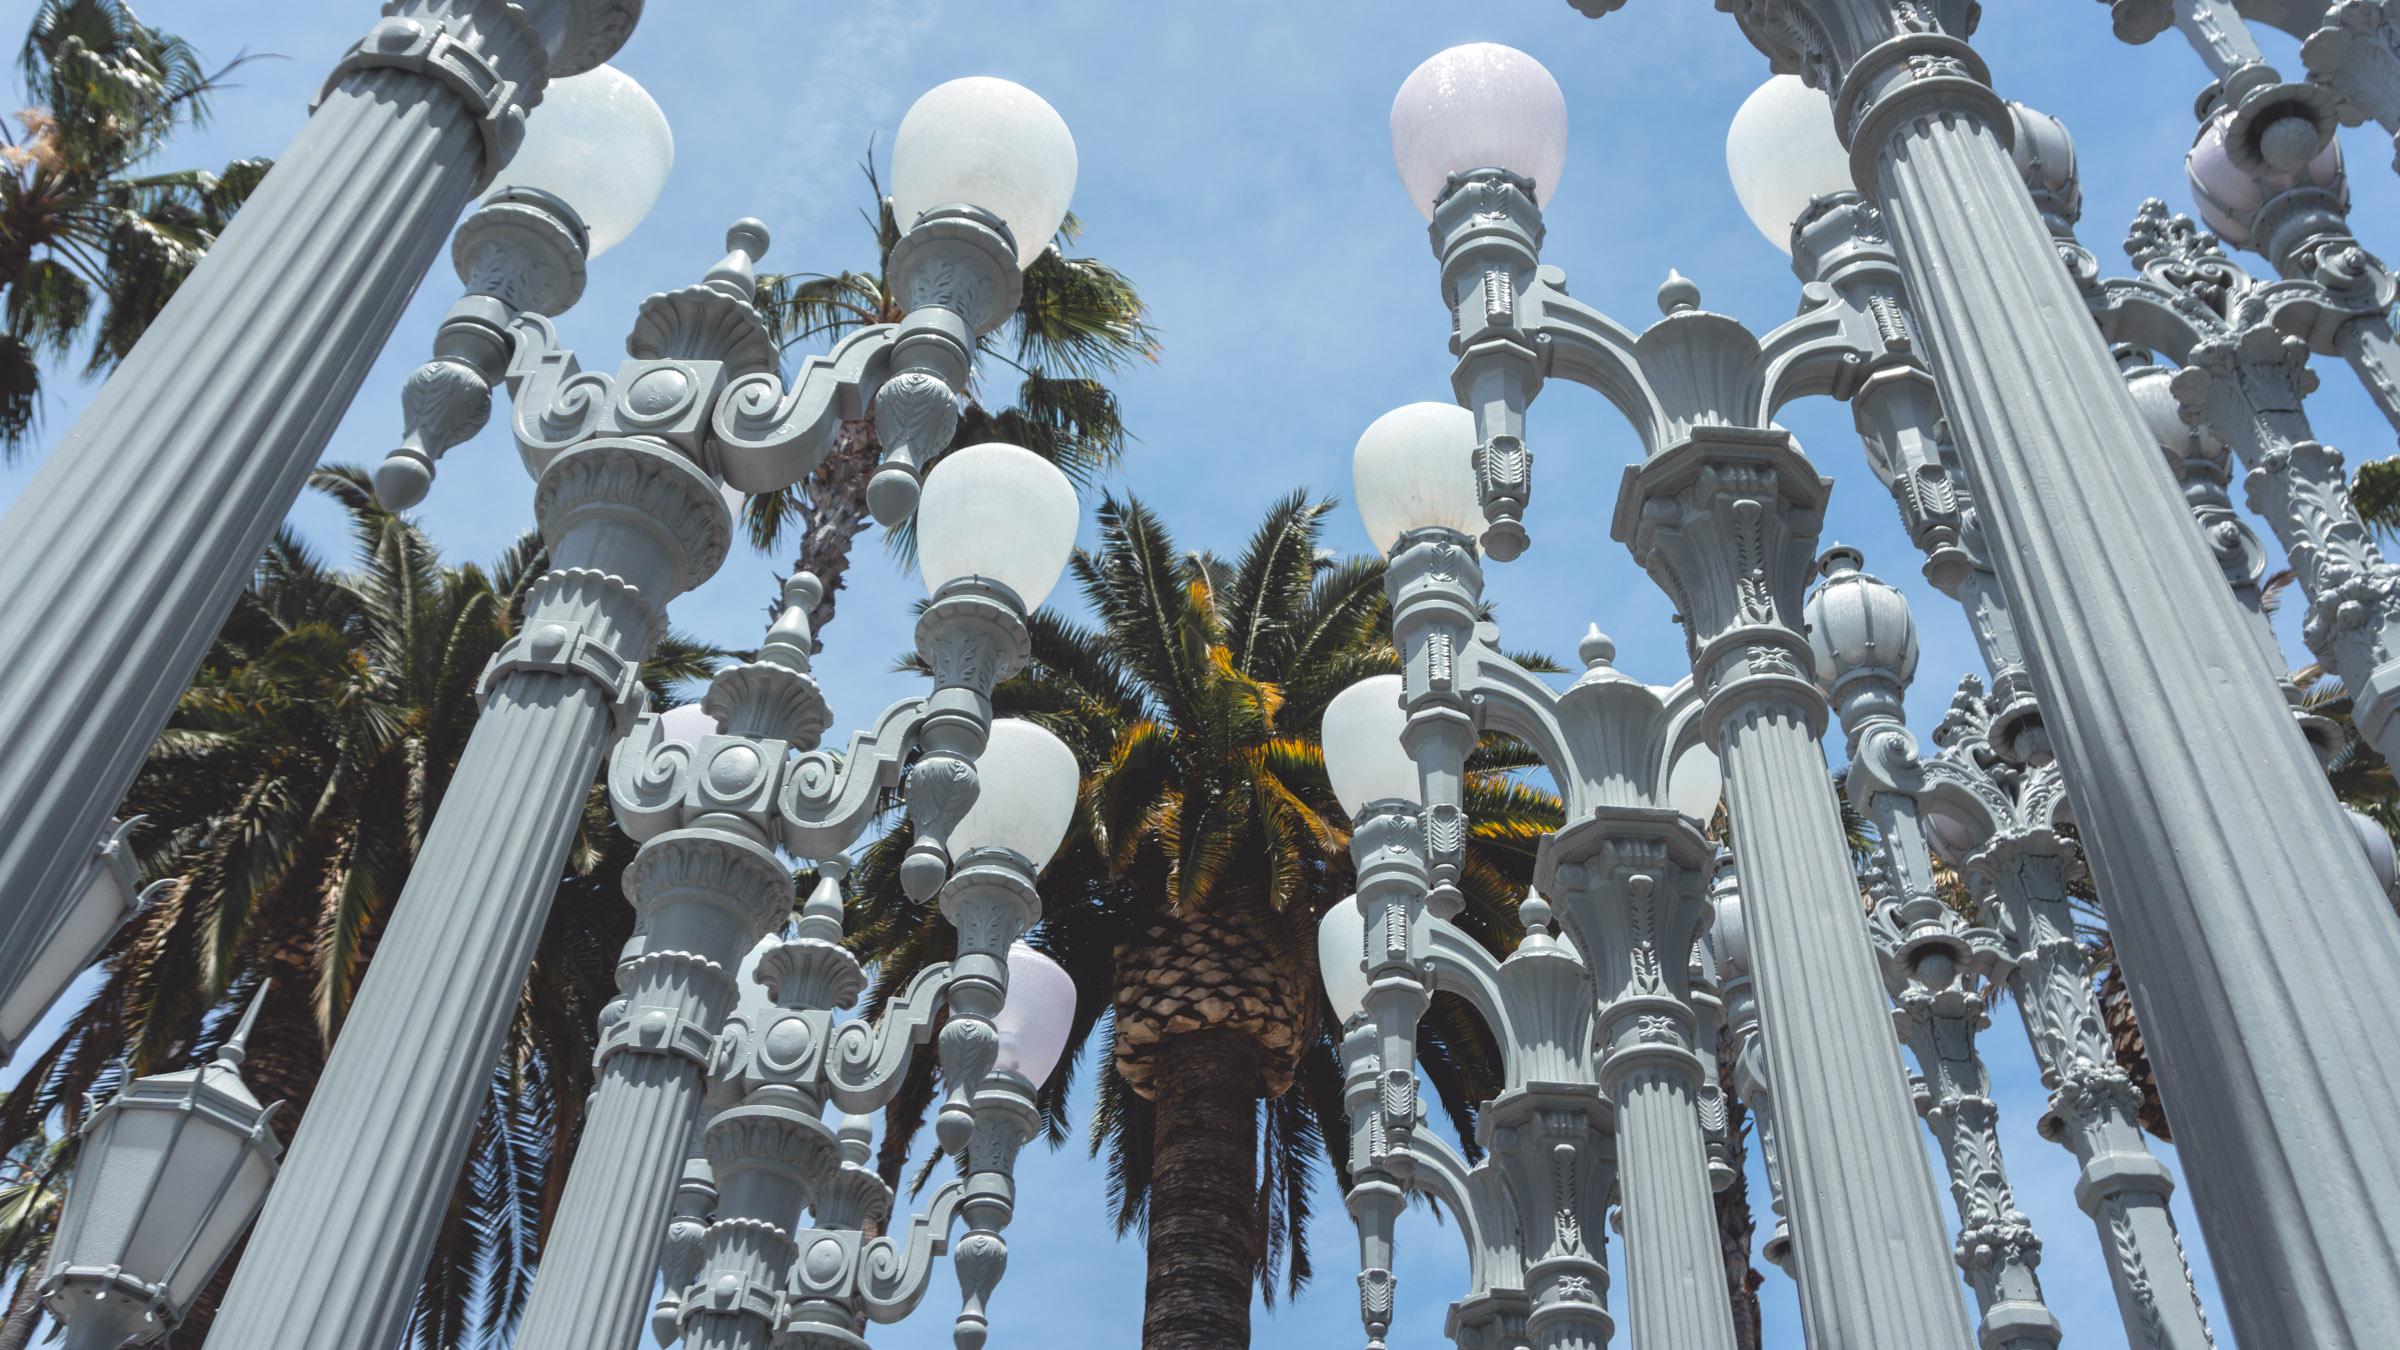 Location: LACMA - Los Angeles, California